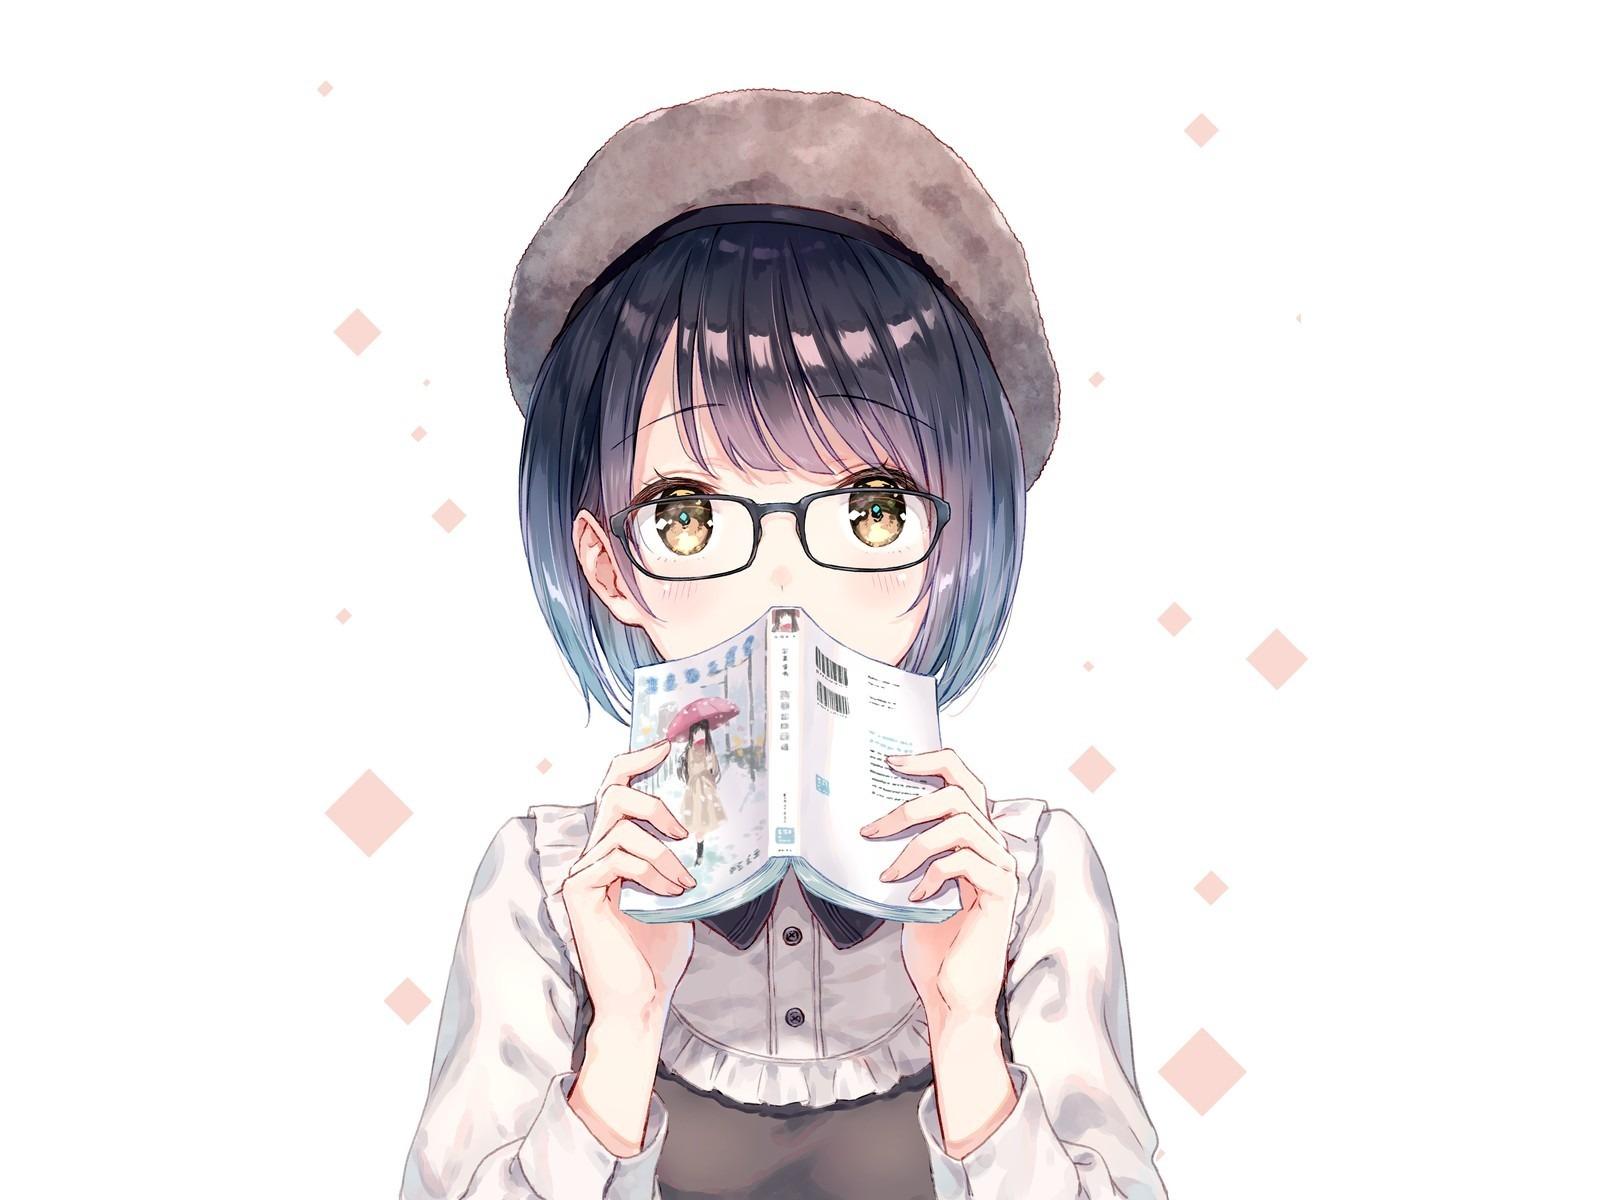 Anime girl short hair book 1600x1200 wallpaper